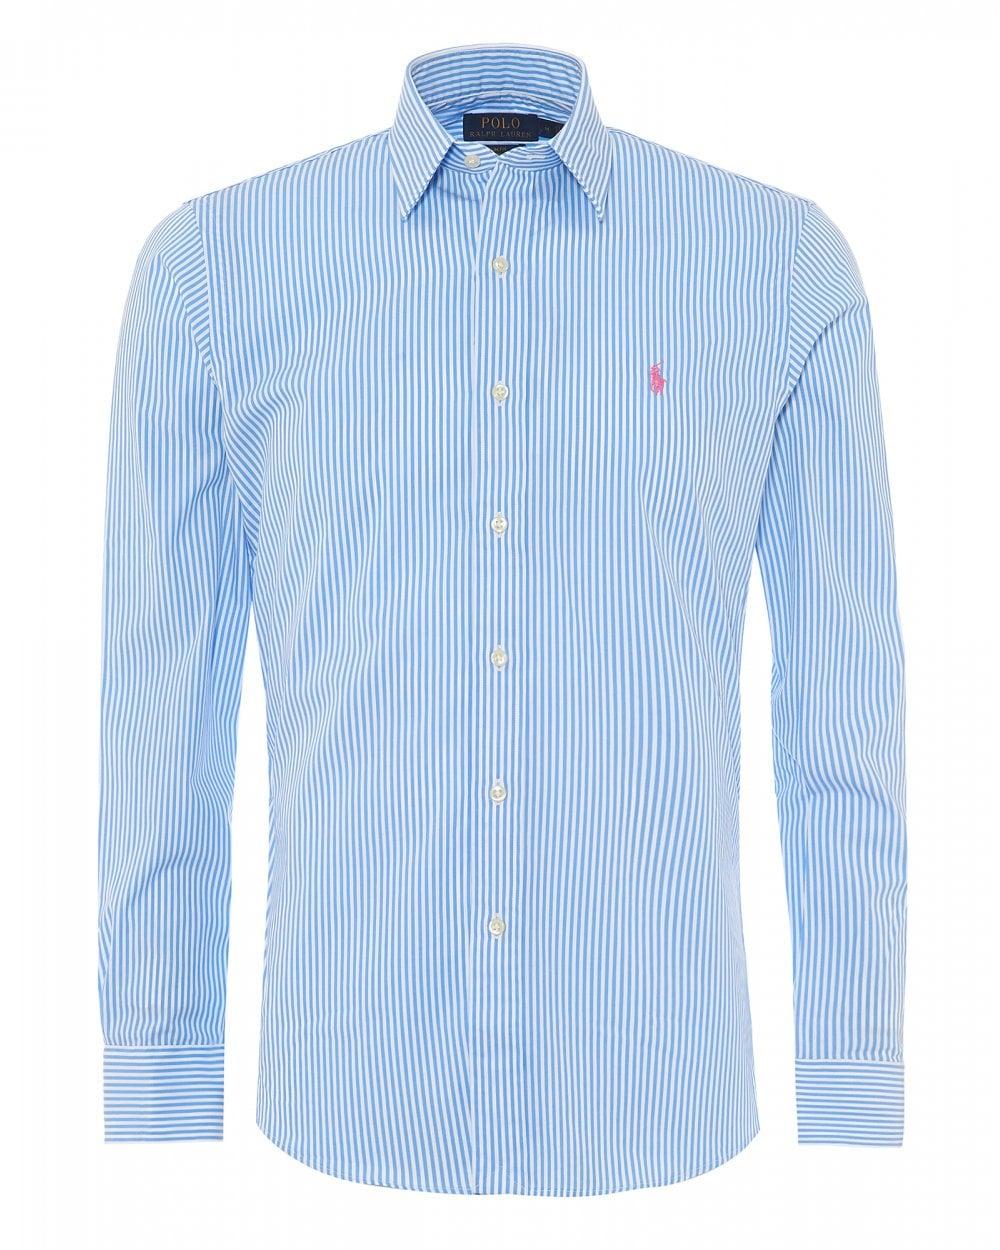 37d419f58a341 Ralph Lauren Men Fine Stripe Powder Blue White Slim Shirt